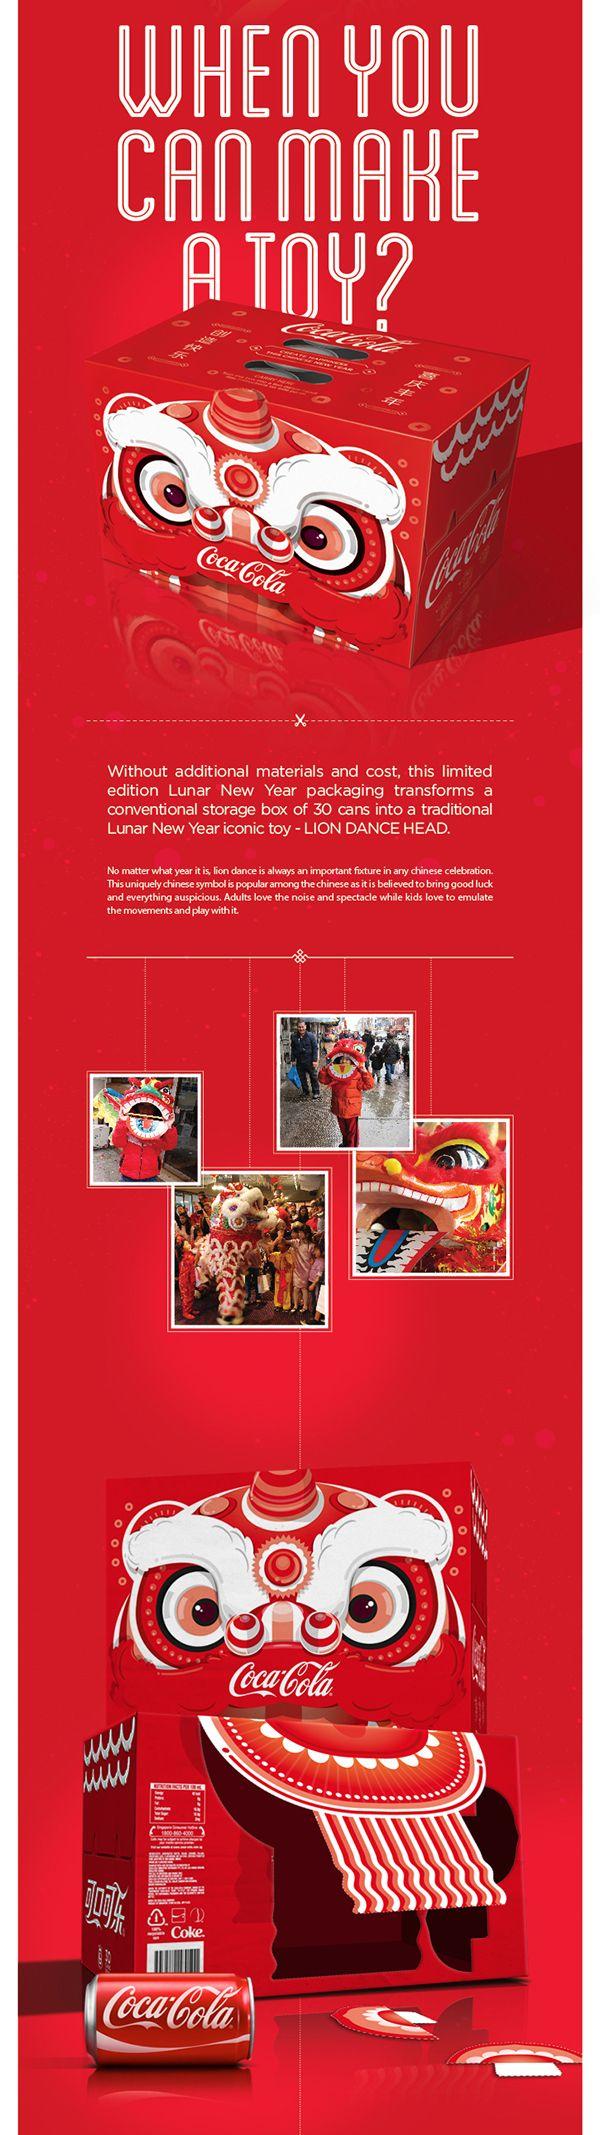 Coca-Cola® 2014 Lion Dance Packaging by Ewan Yap, via Behance